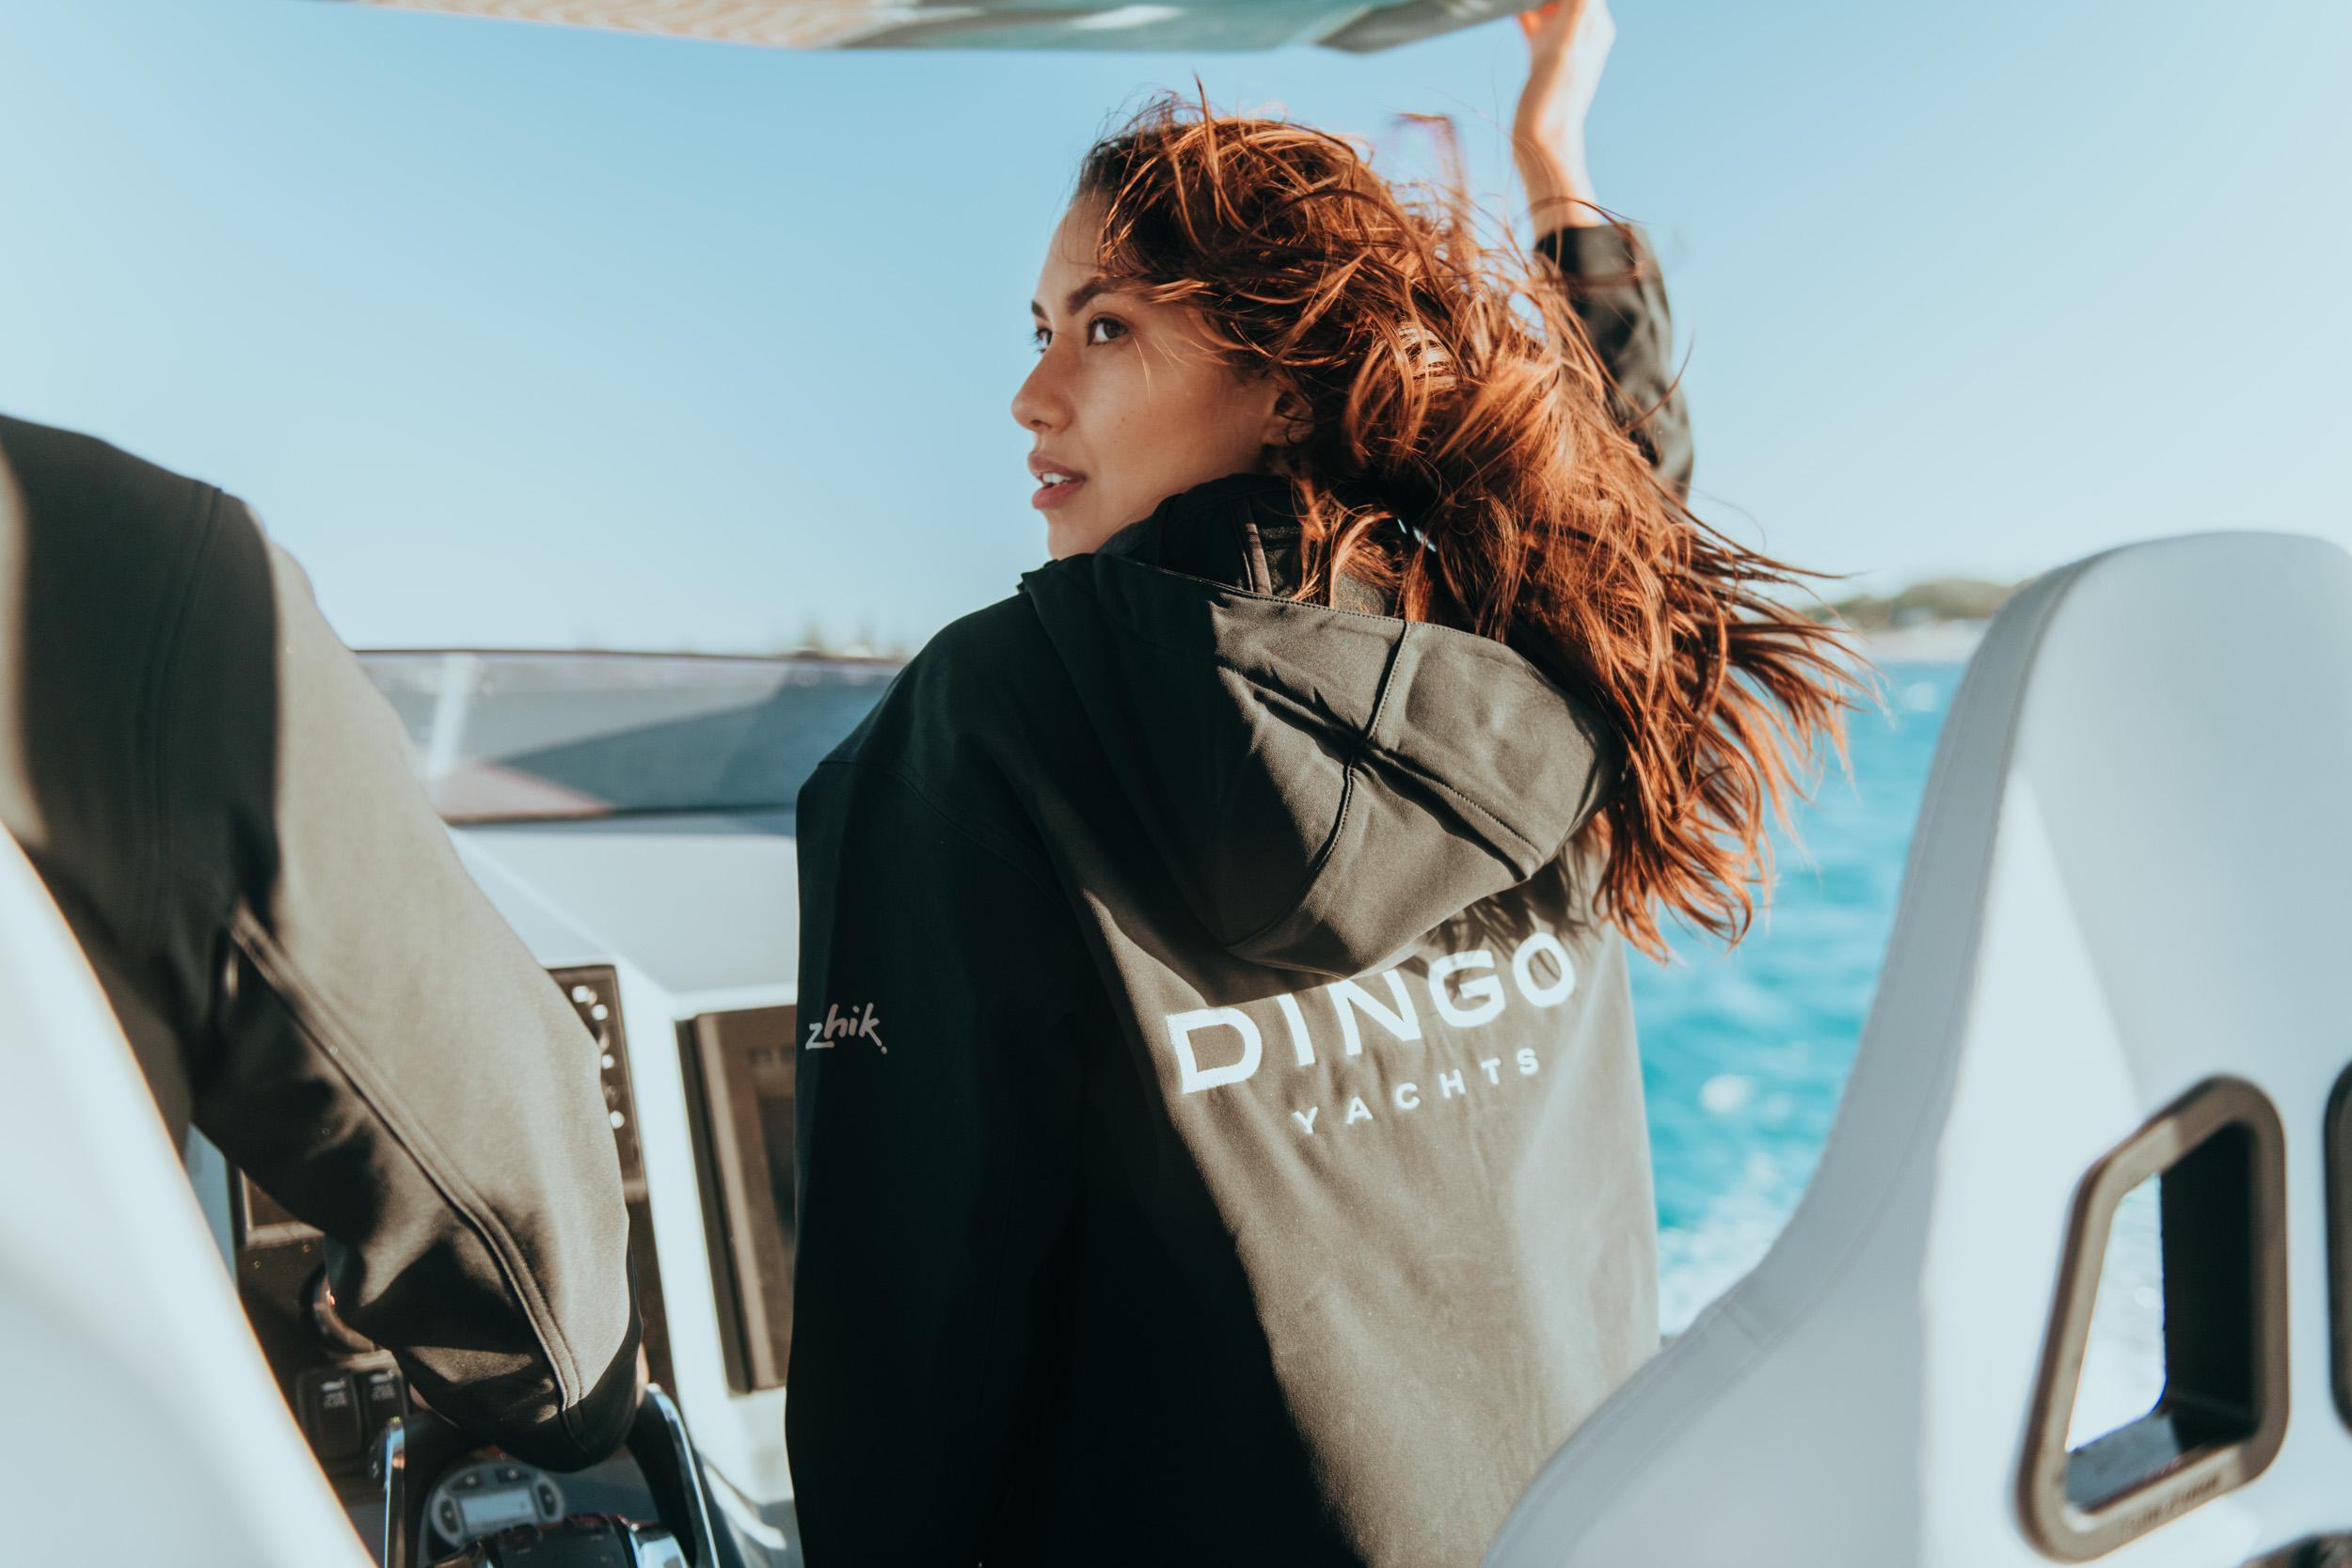 DINGO-YACHTS_1506.jpg